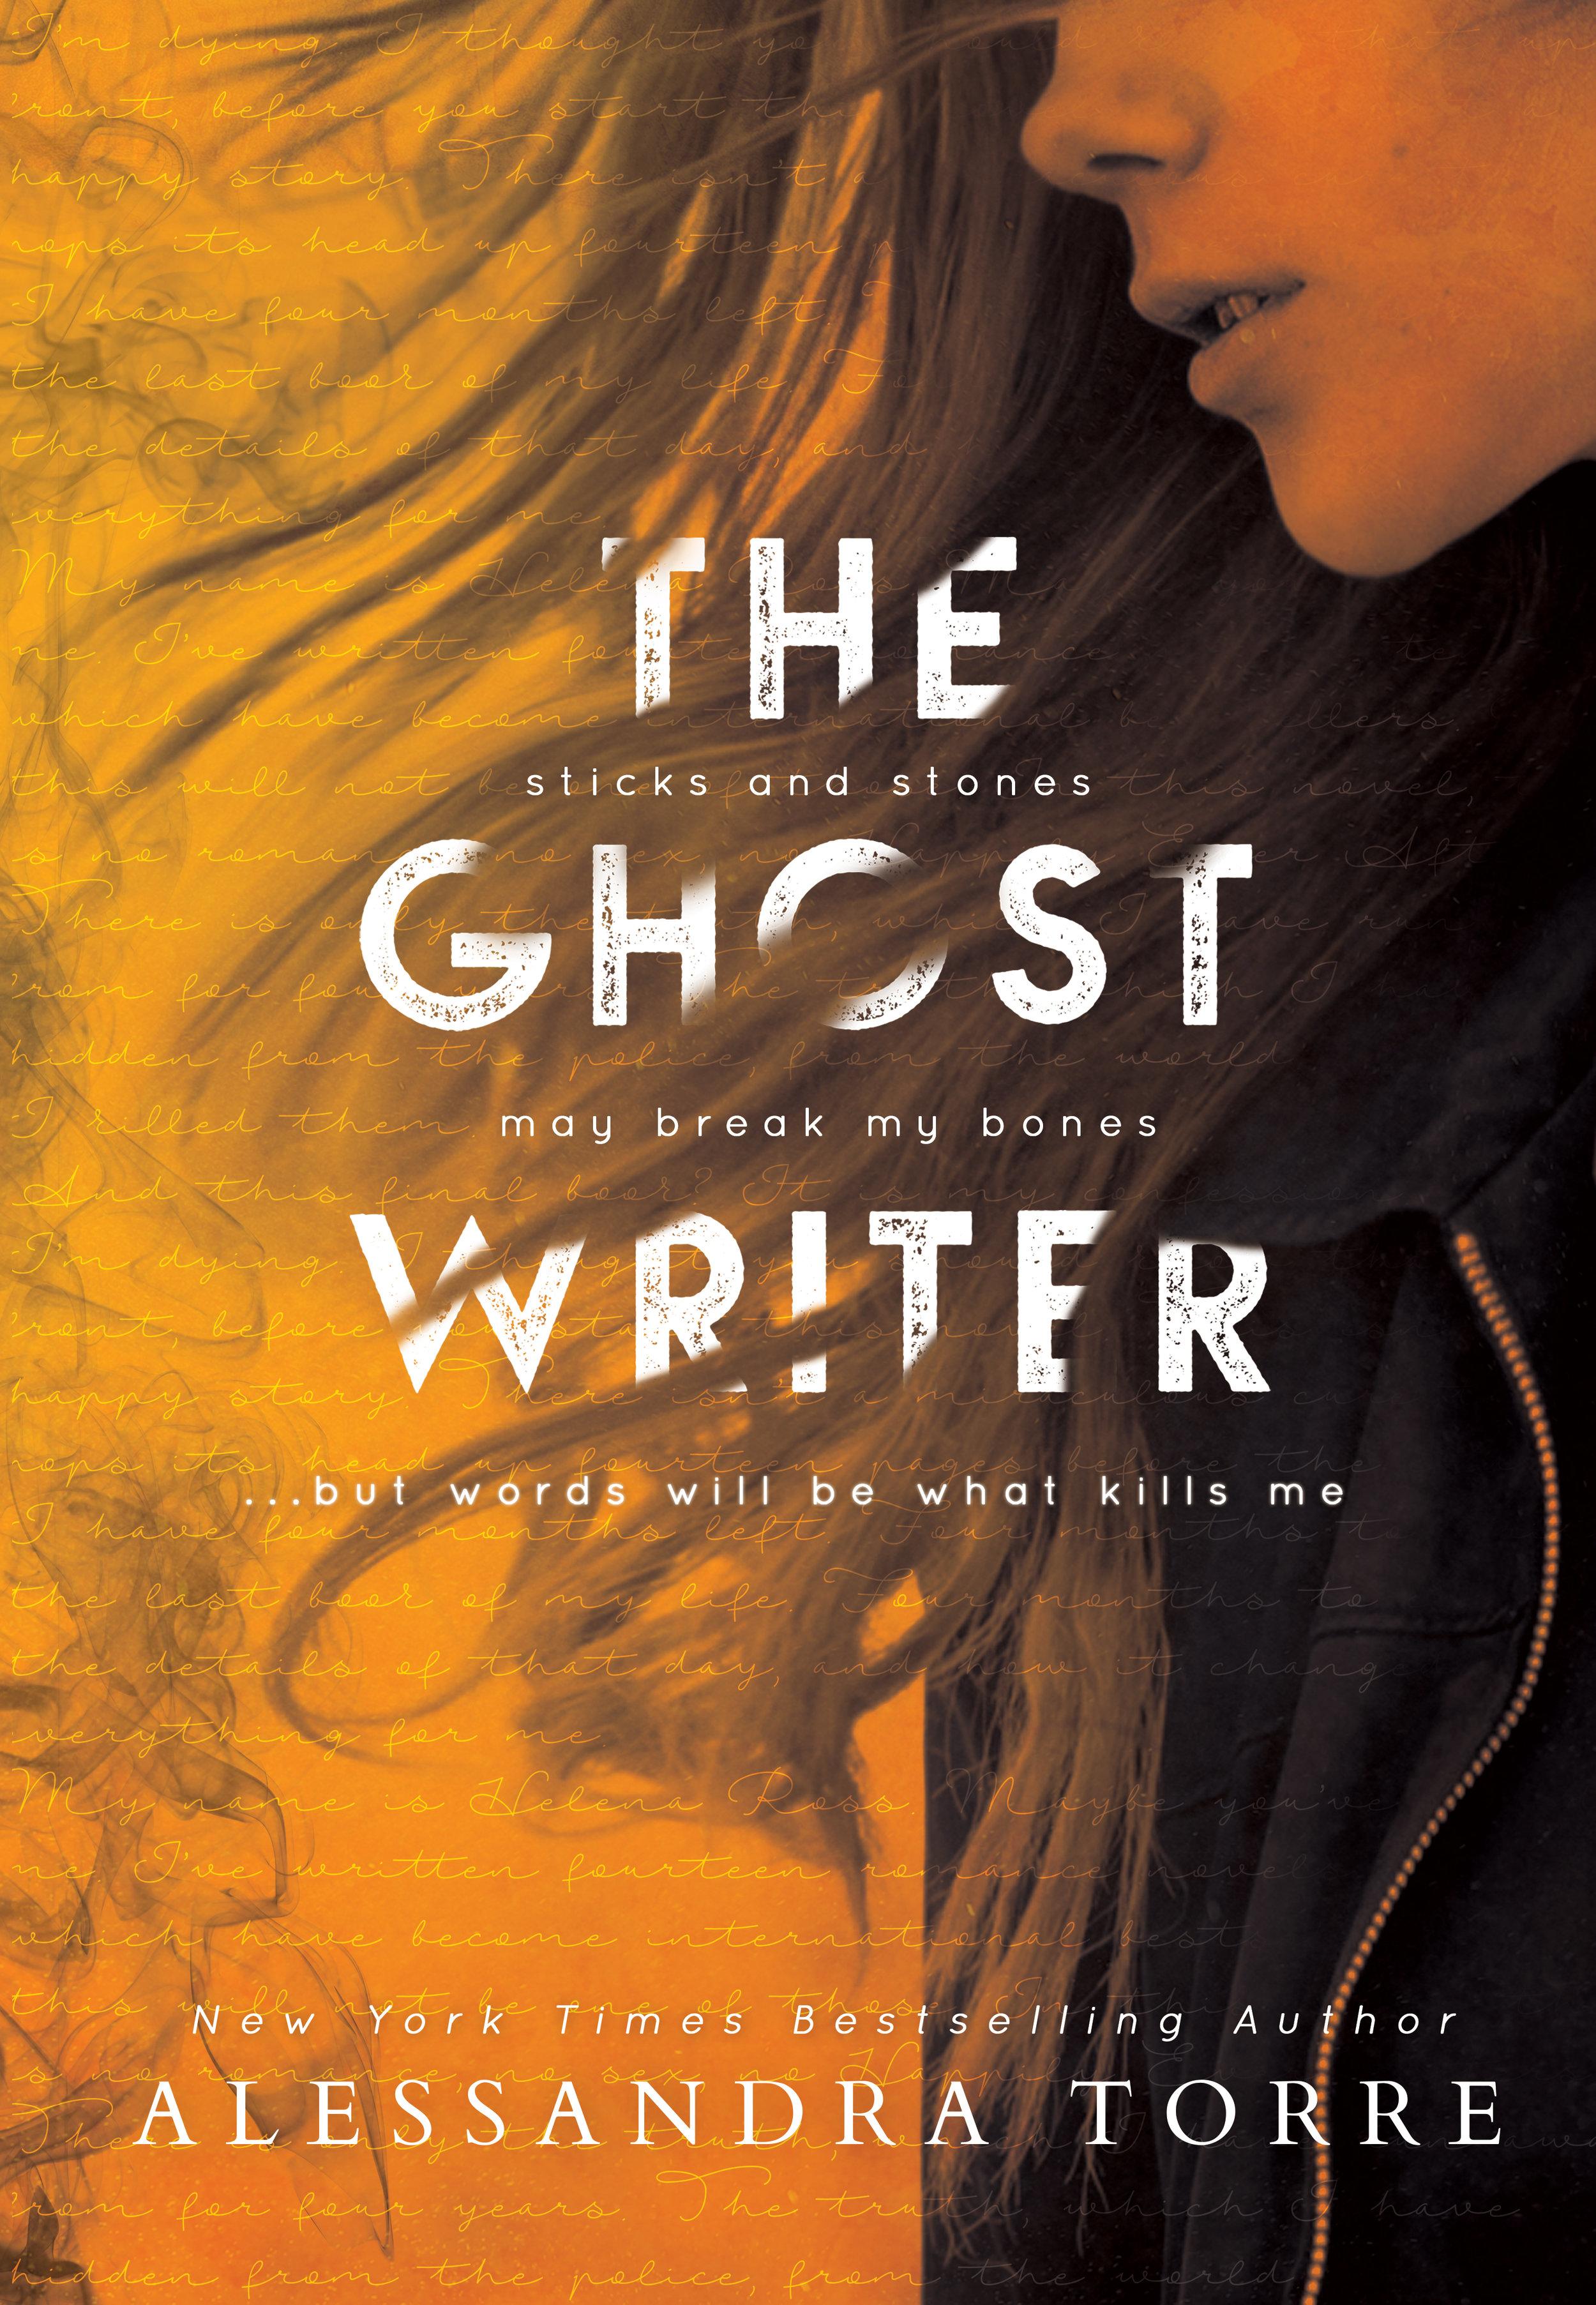 the ghostwriter ebook cover